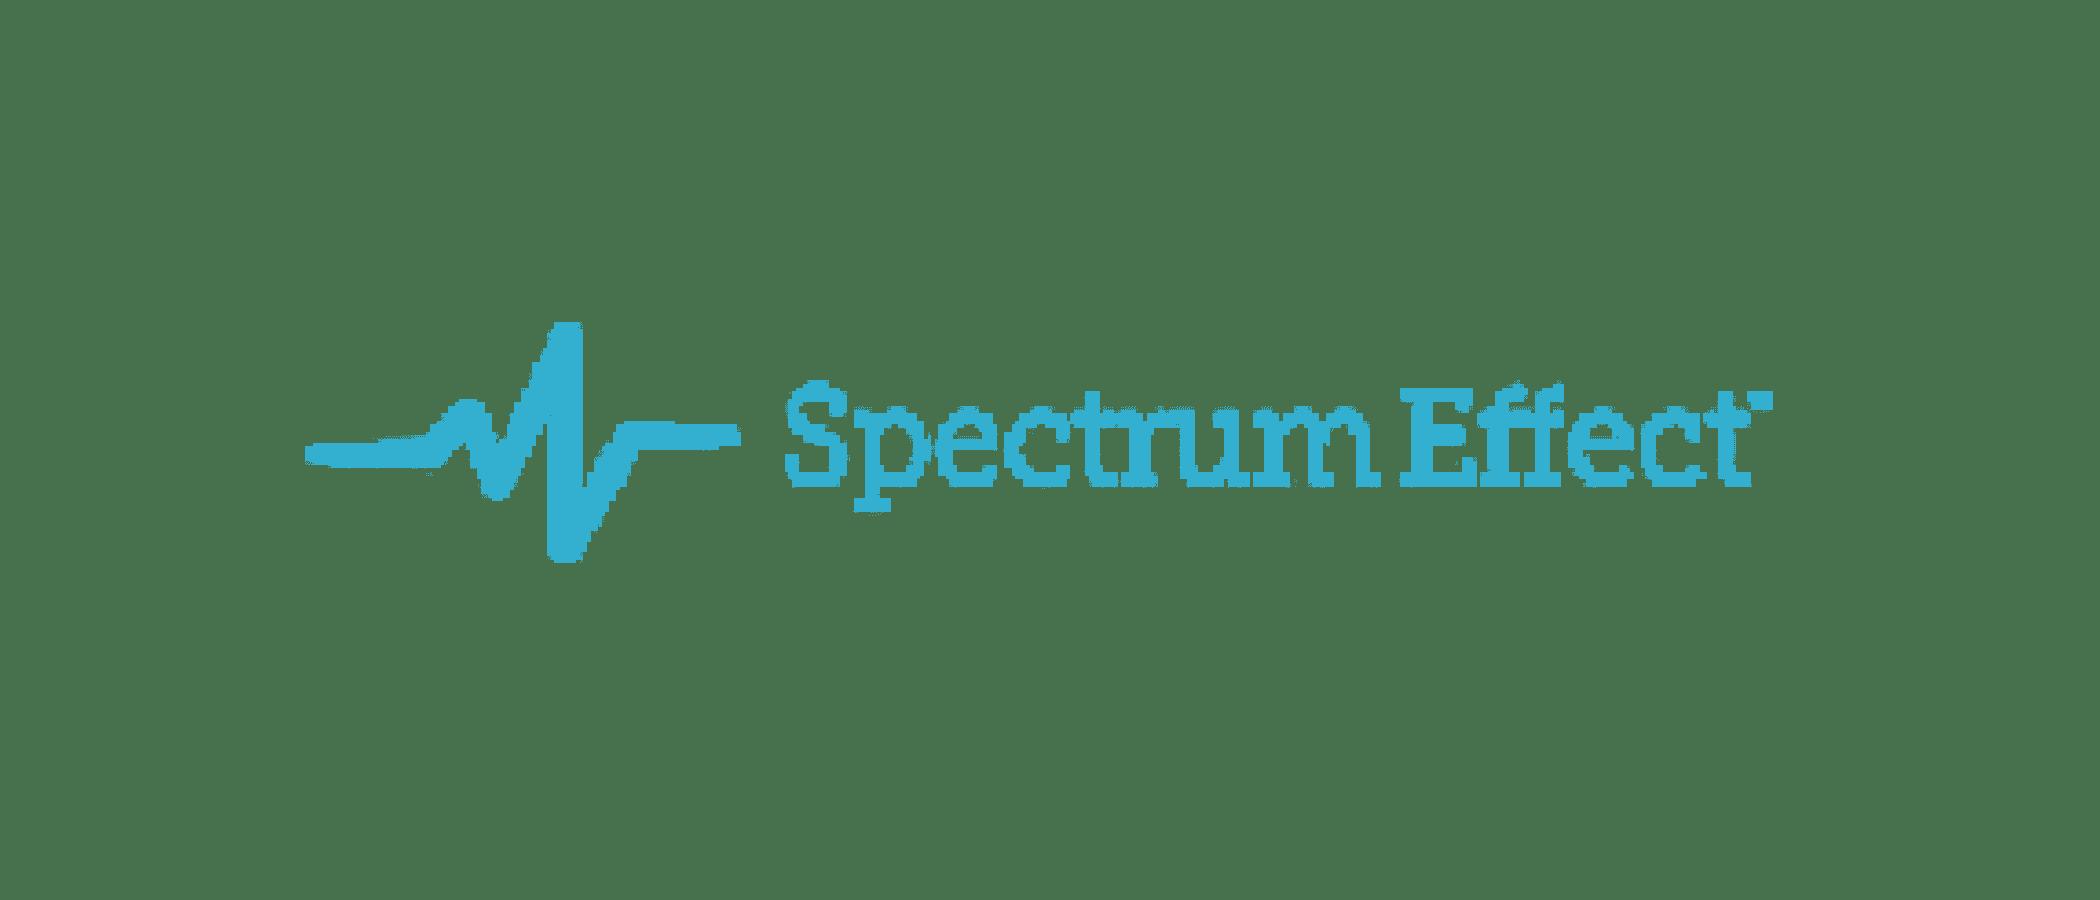 spectrum effect company logo color